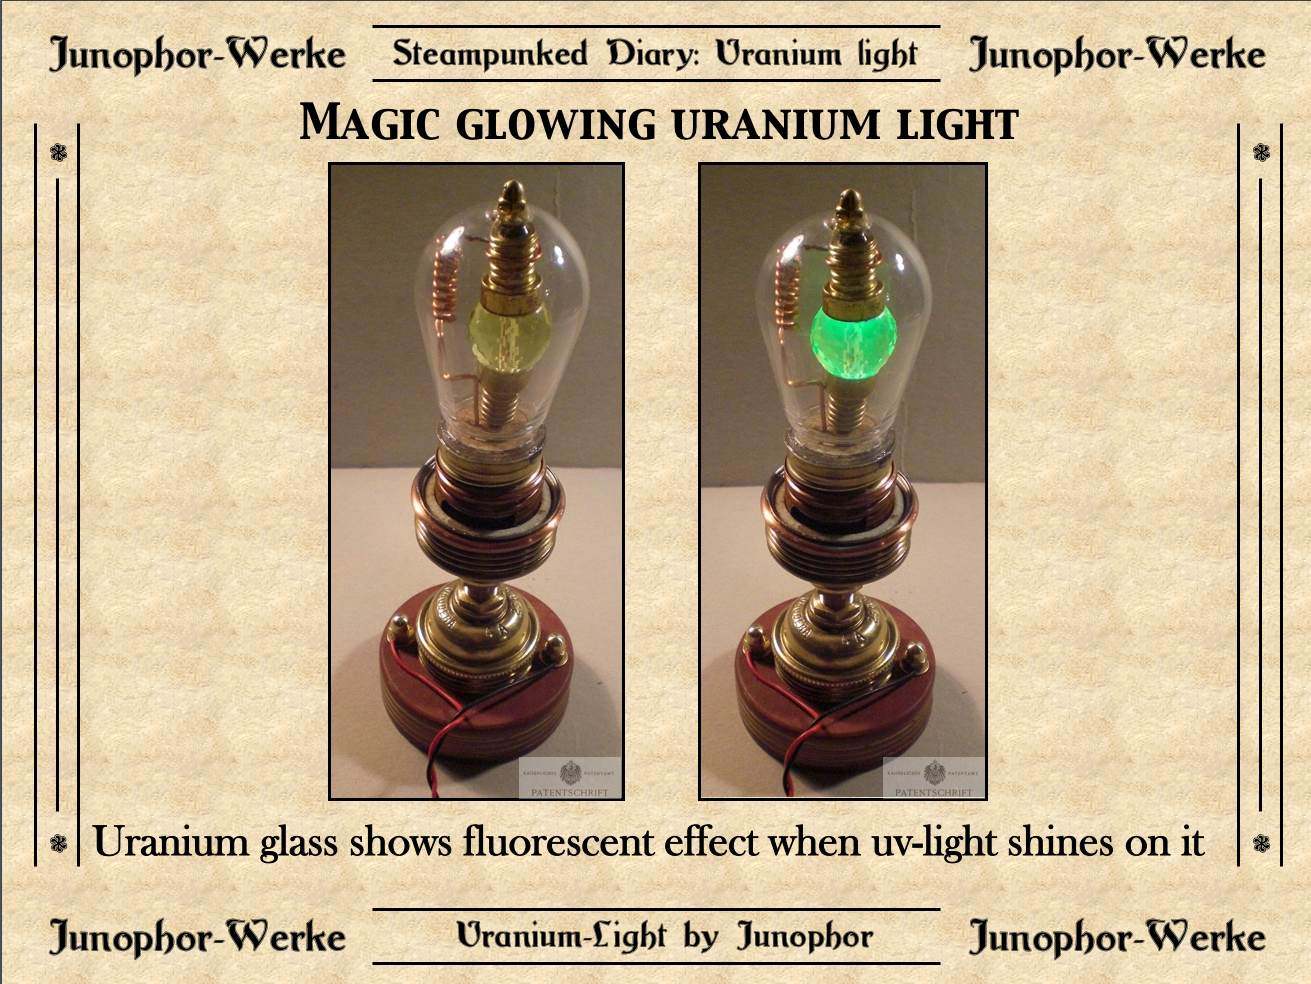 Picture of Steampunked Magic Uranium Light